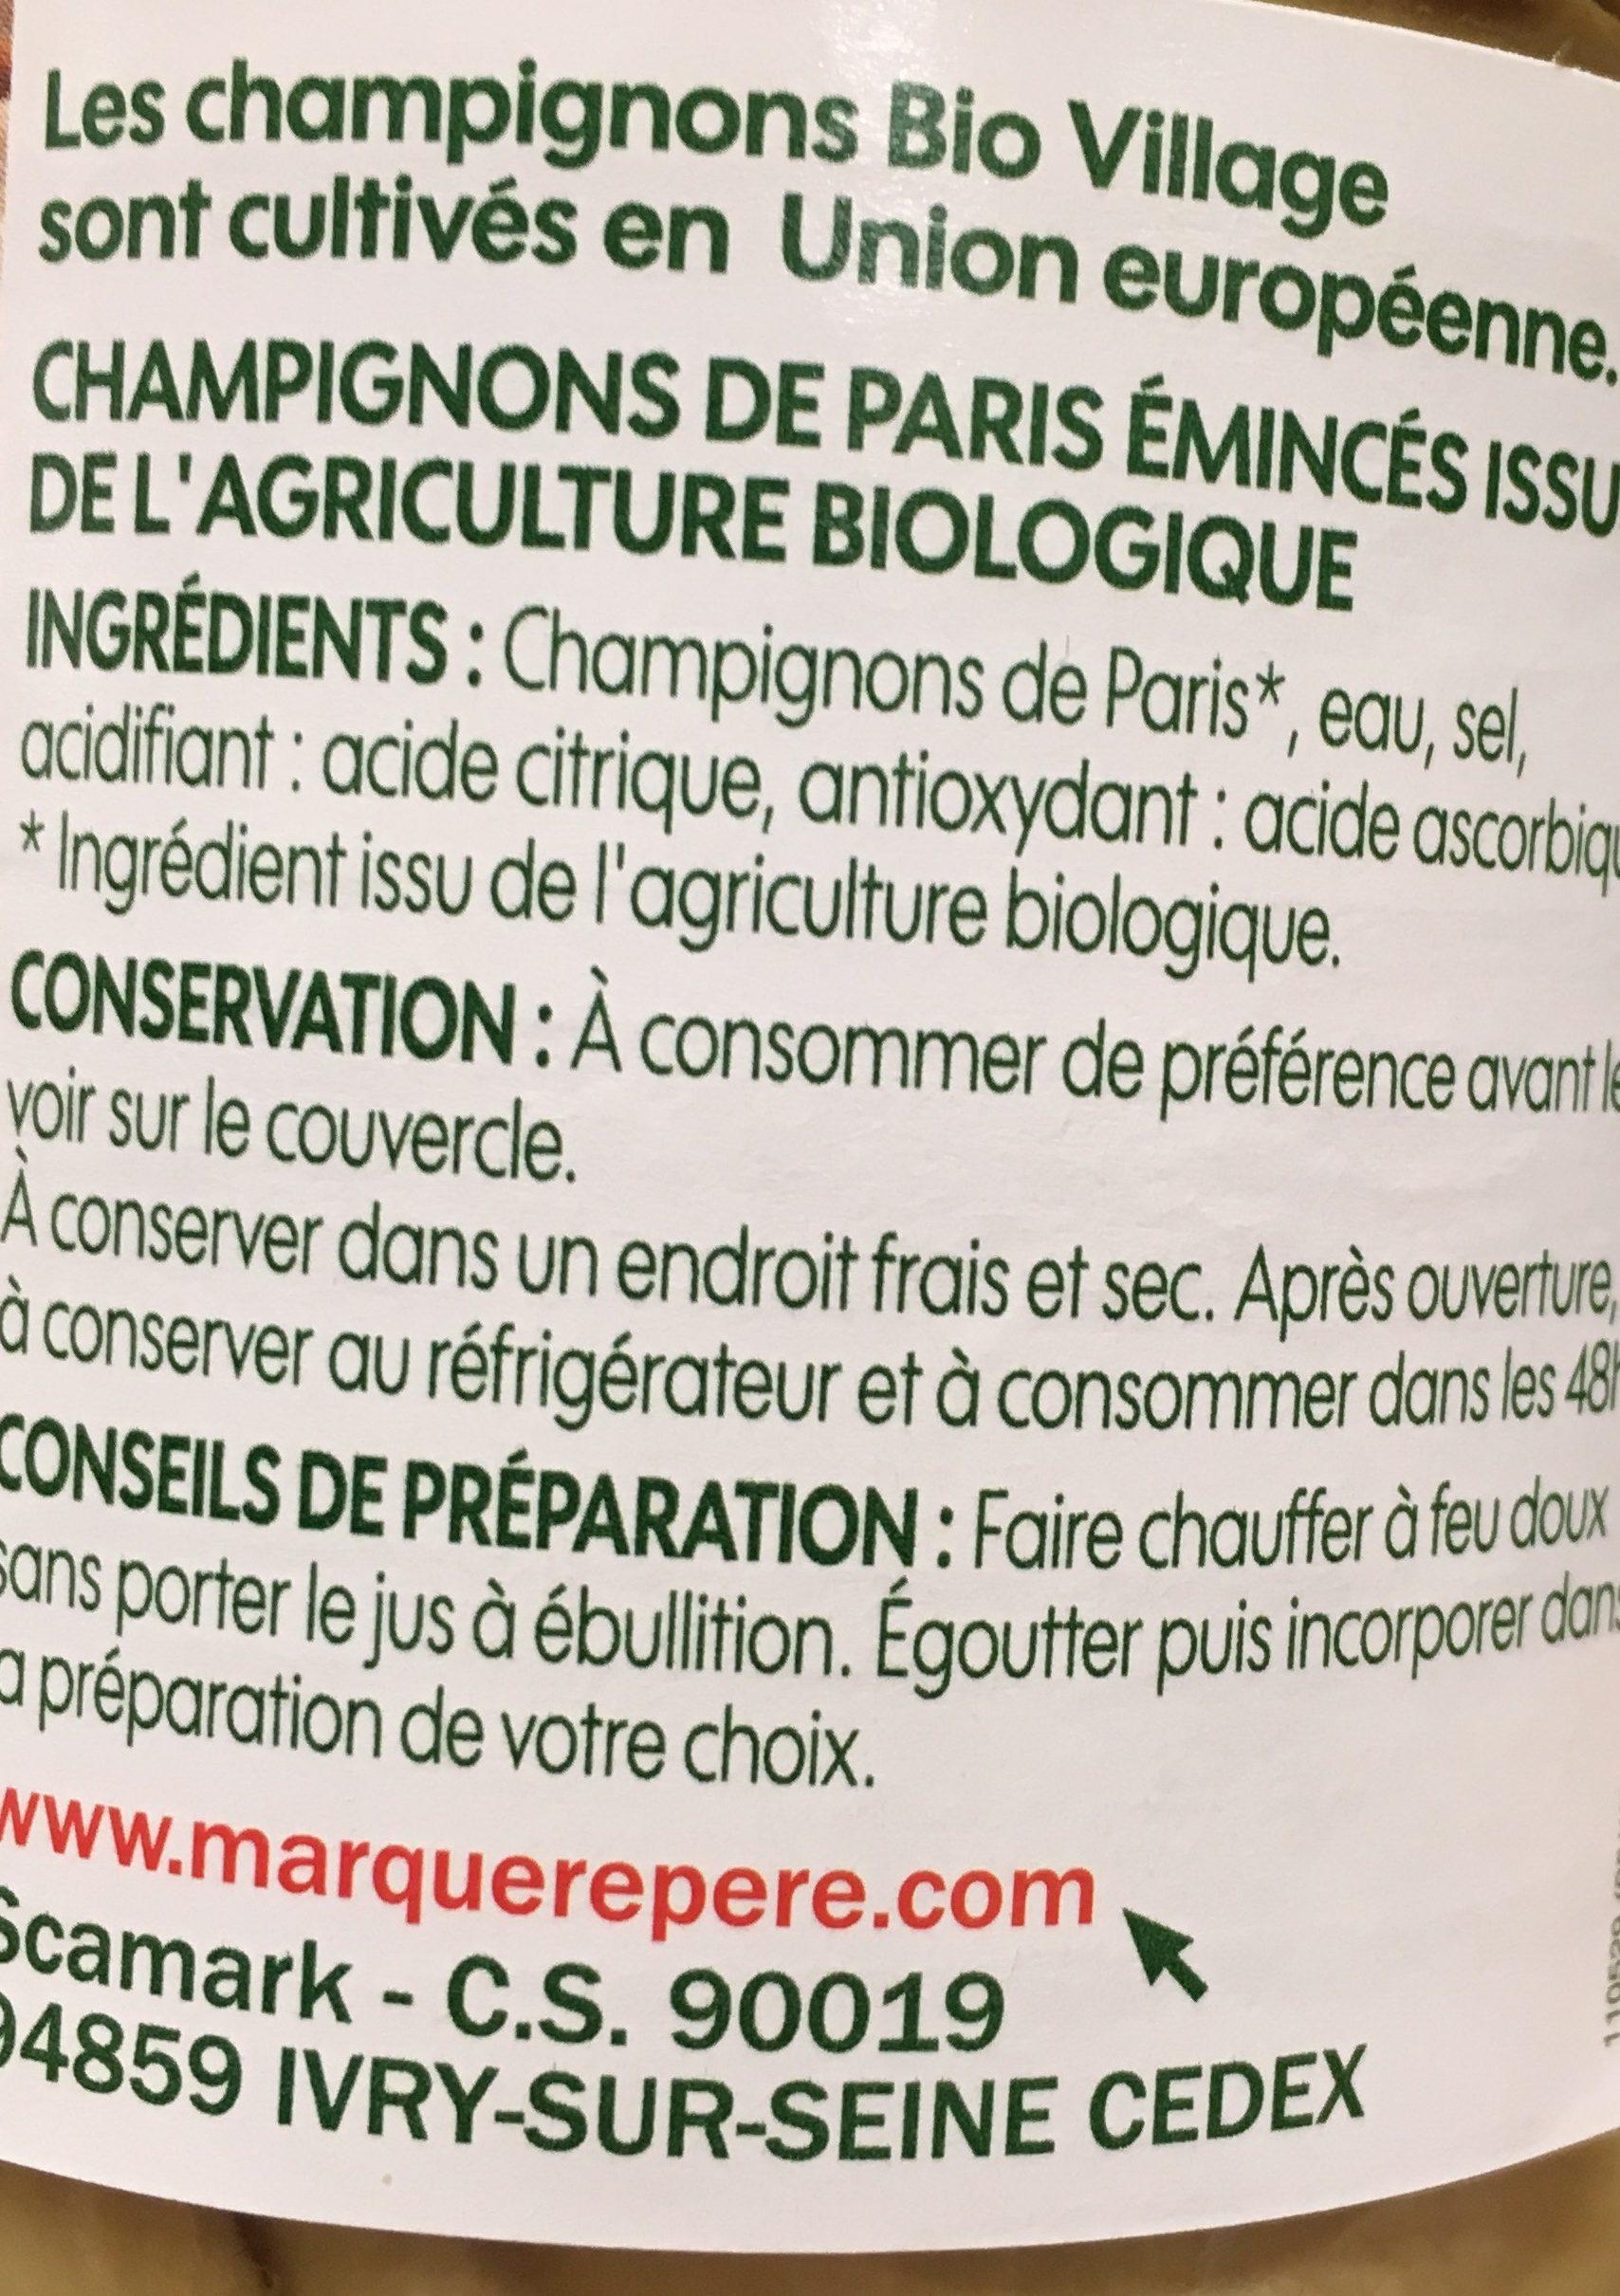 Champignons de Paris émincés bio - Ingrediënten - fr